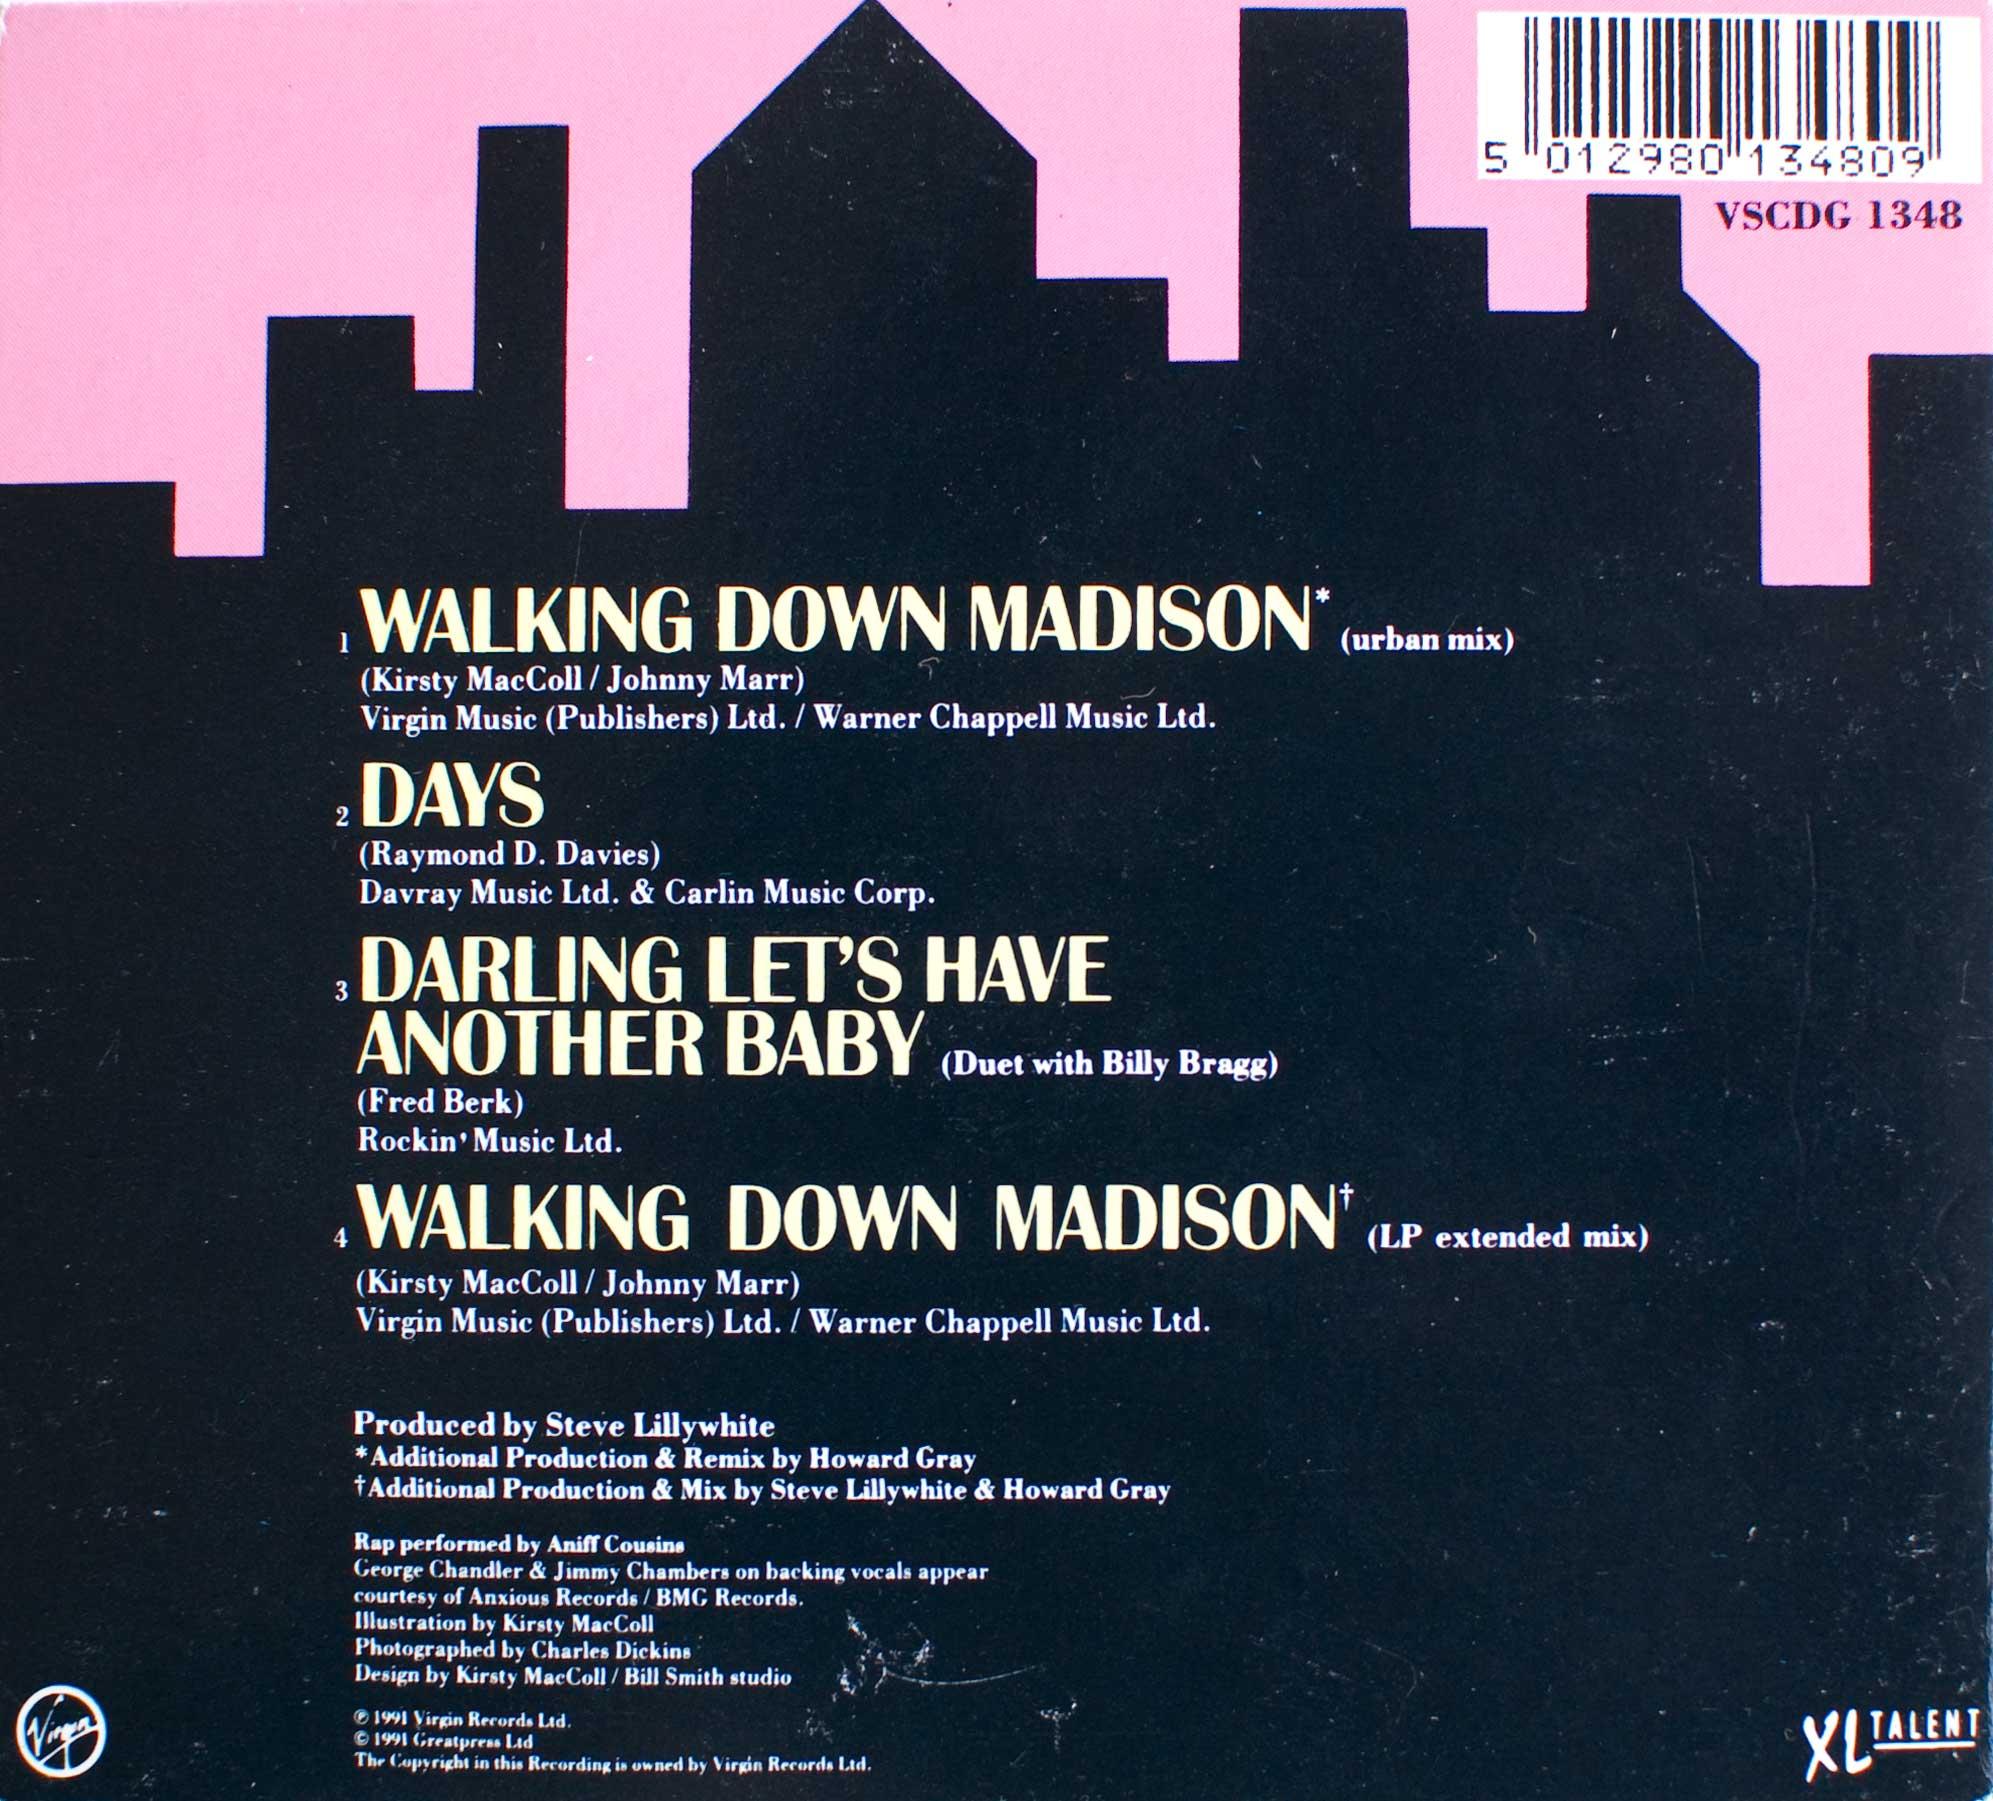 Walking Down Madison (CD single 2) back cover